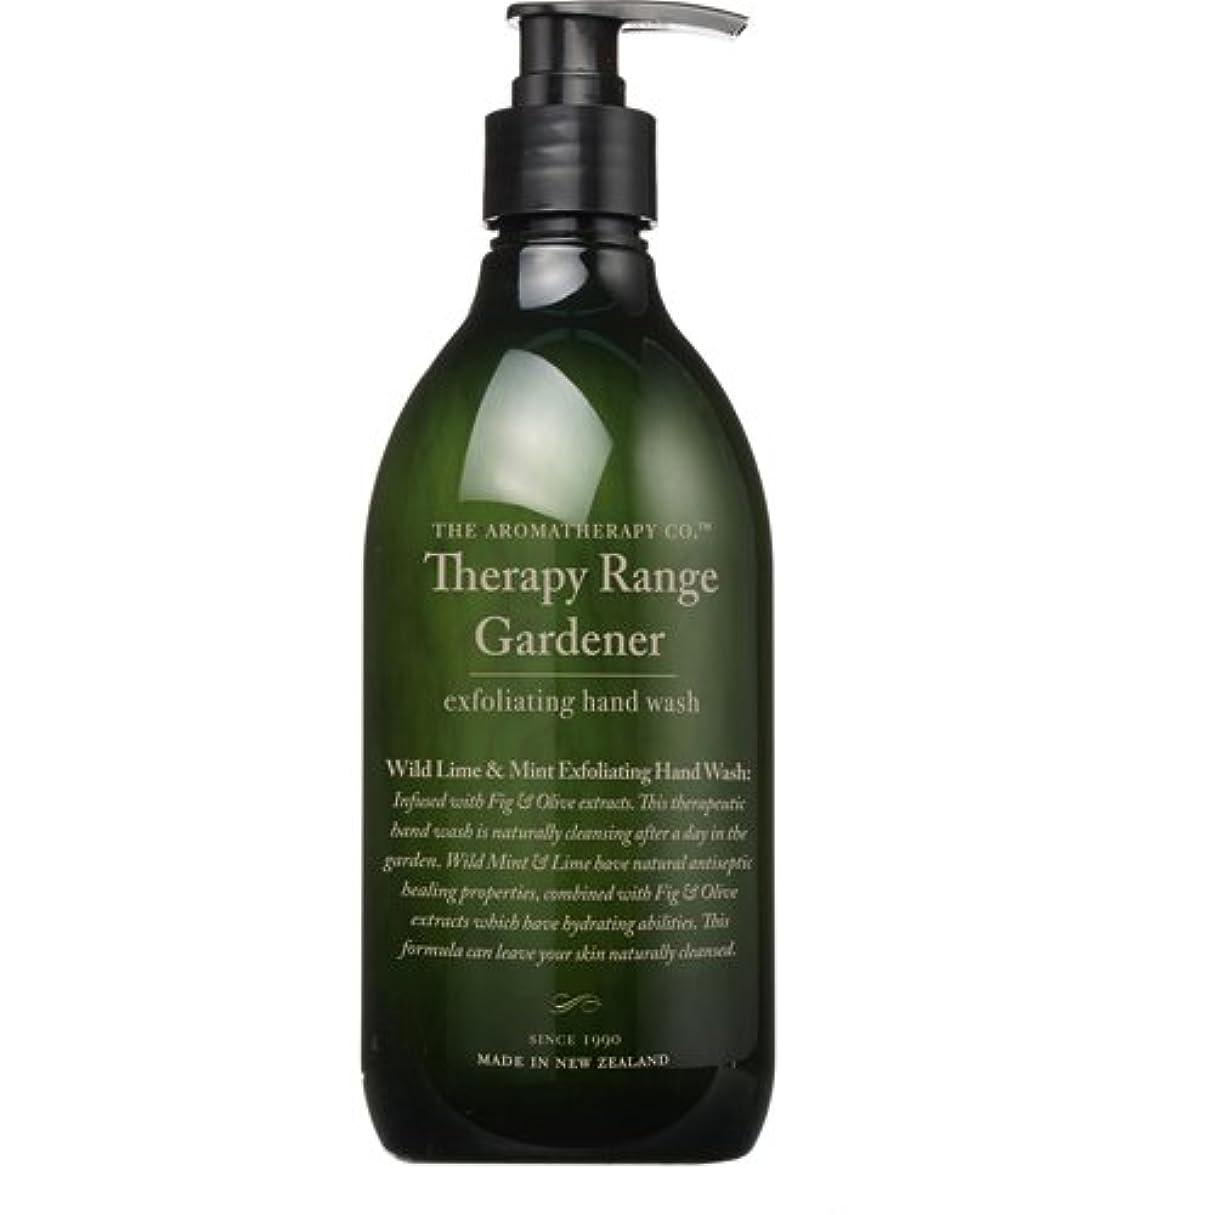 Therapy Garden セラピーガーデン Hand&Body Wash ハンド&ボディウォッシュ